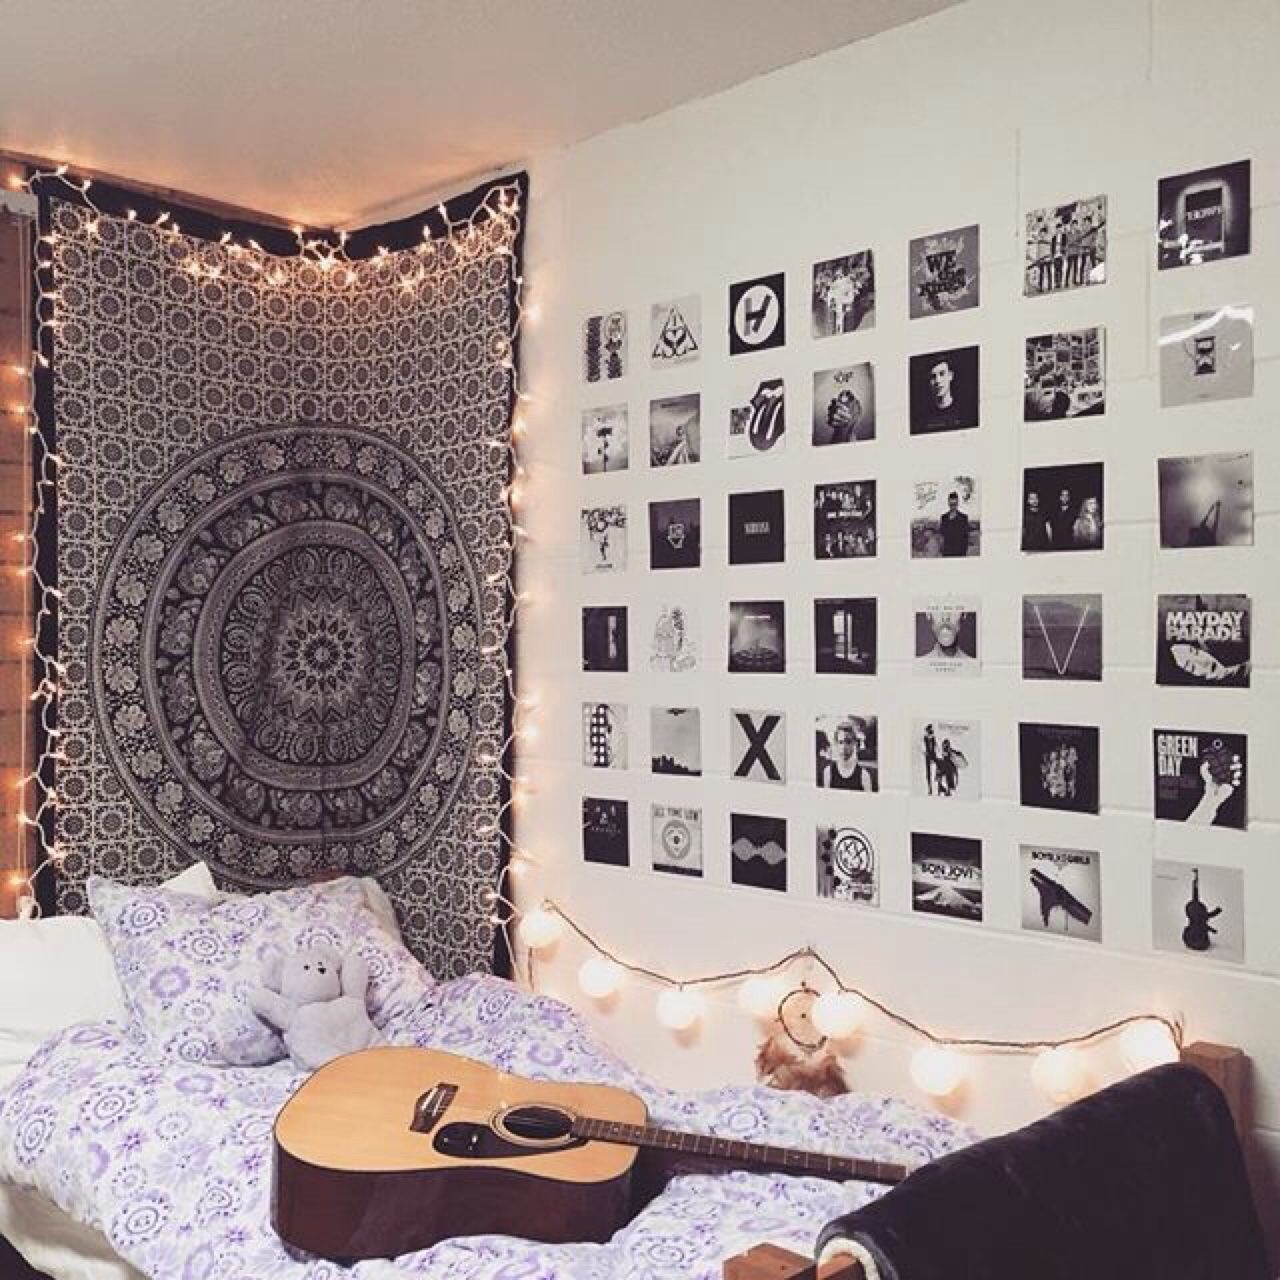 Room wall decor tumblr - Room Inspiration